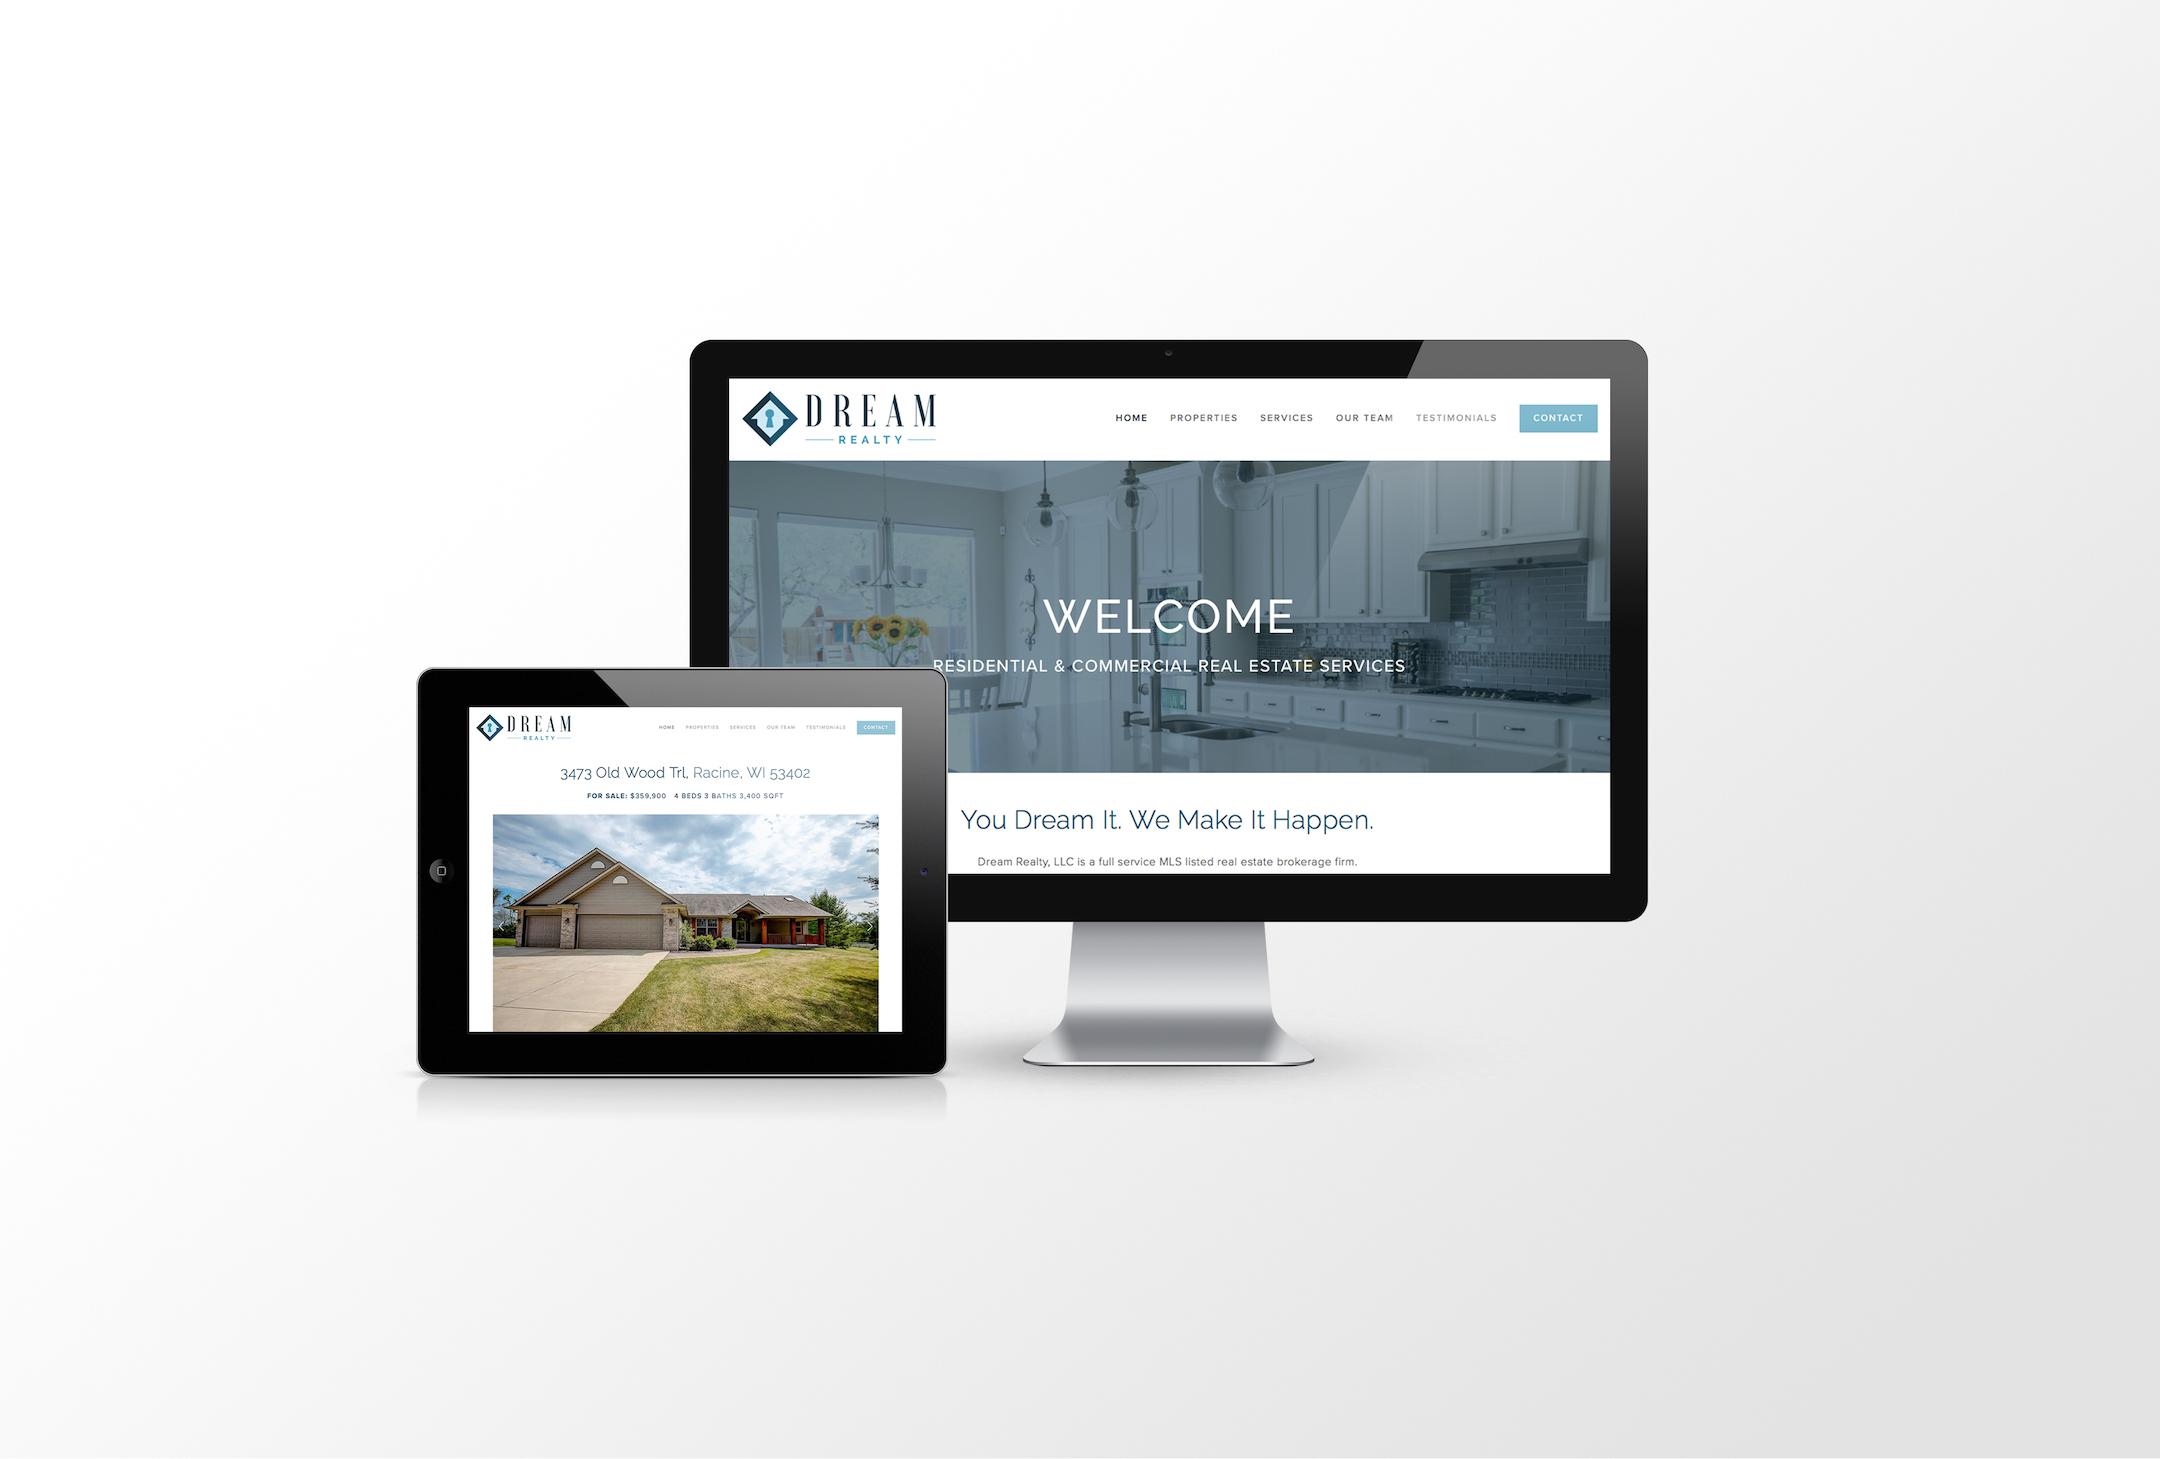 Golden-Antler-Design-Milwaukee-Wisconsin-Branding-Print-Web-Serivces-Web-Decvelopment-Website-Dream-Realty